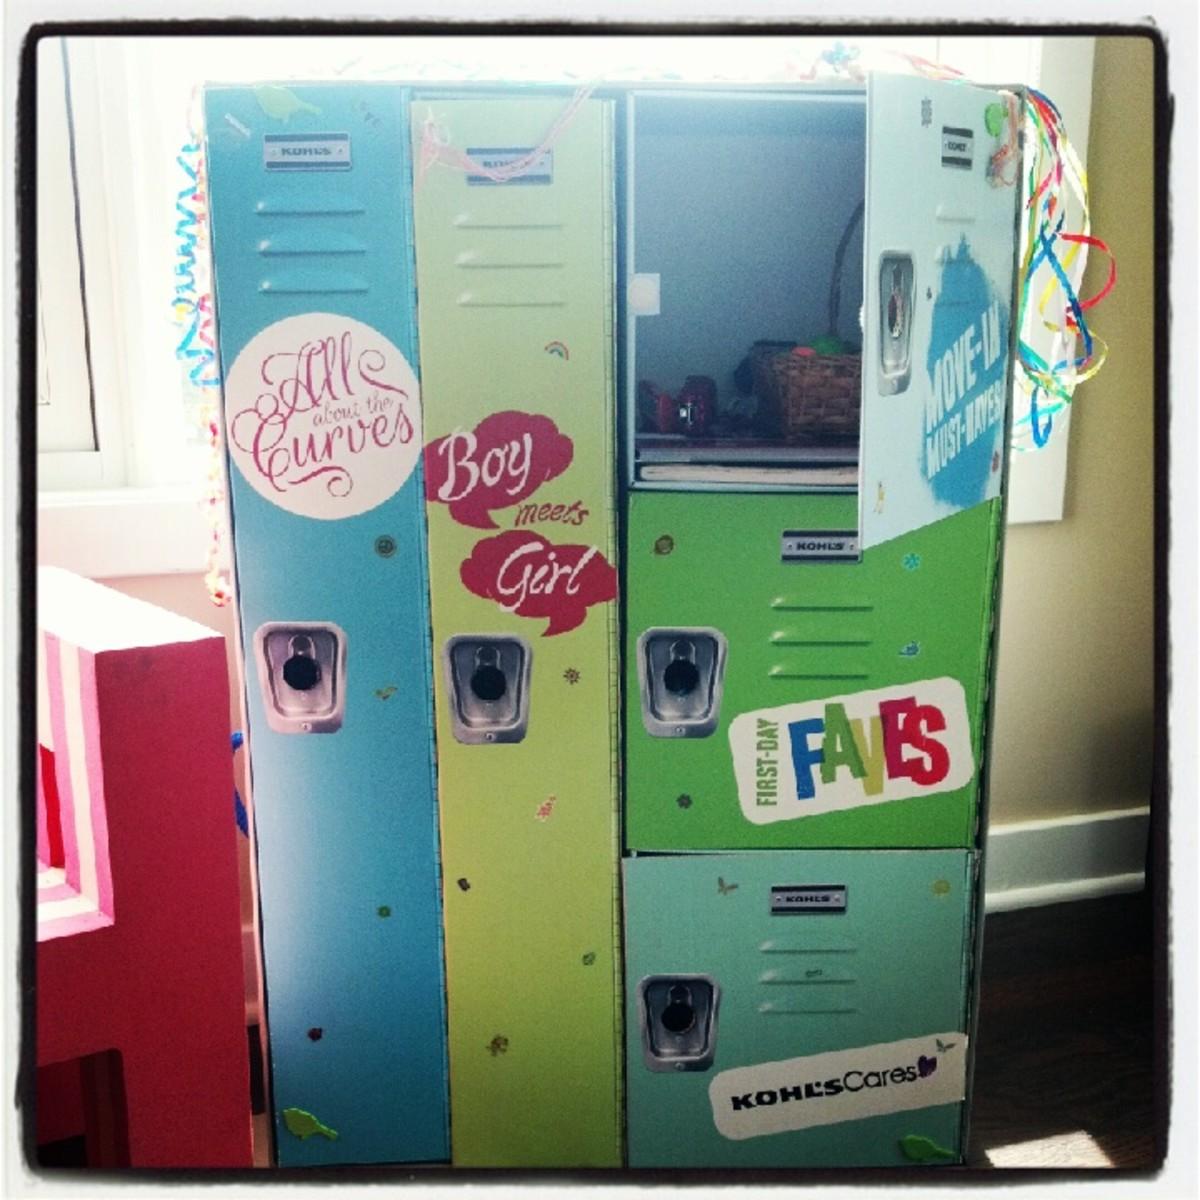 kohl's locker box